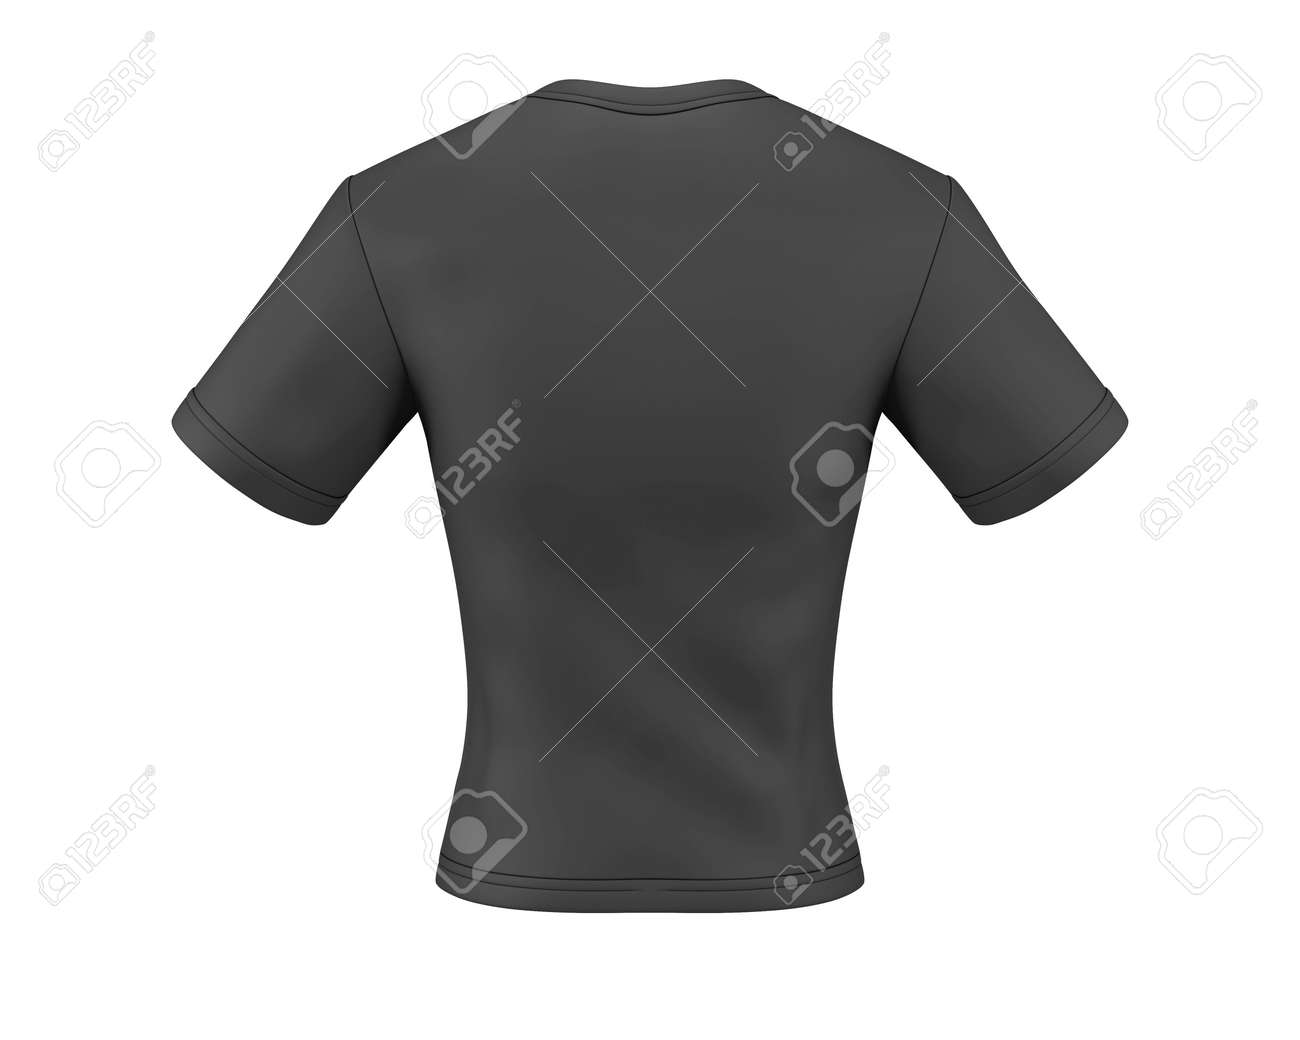 Black T Shirt Back Template For Your Design 3d Illustration Stock